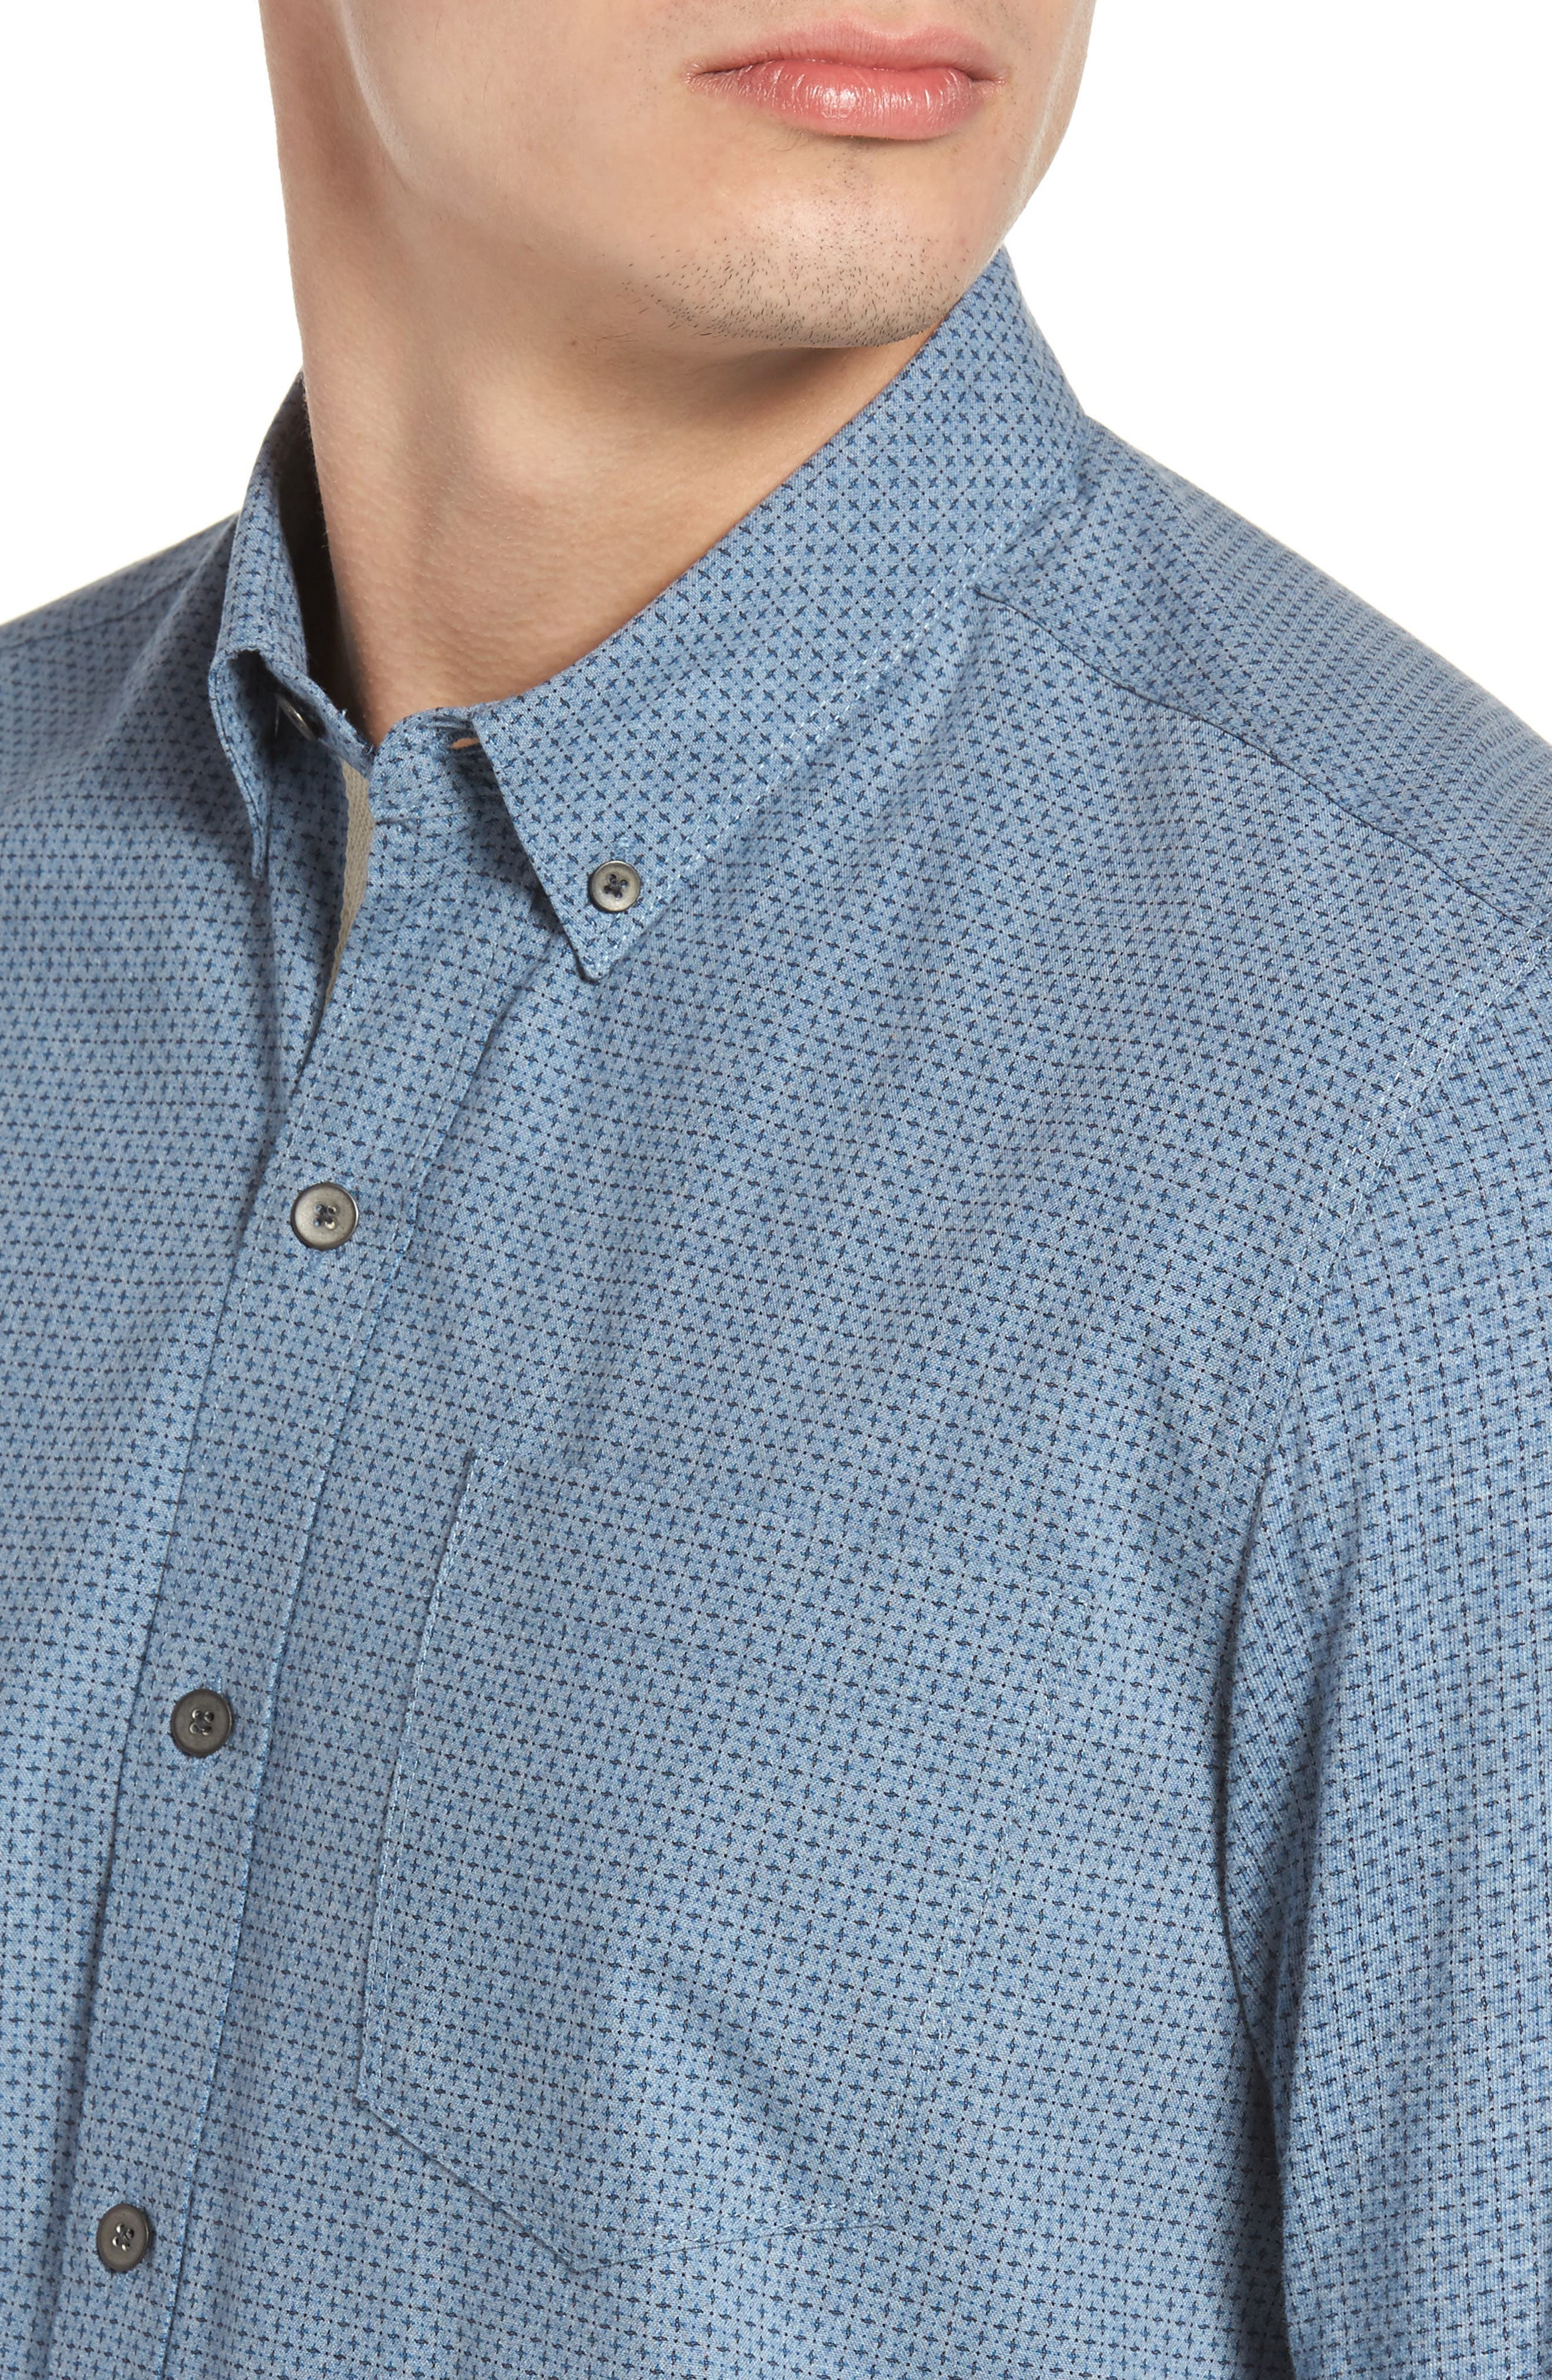 Reworked Patterned Sport Shirt,                             Alternate thumbnail 4, color,                             Blue